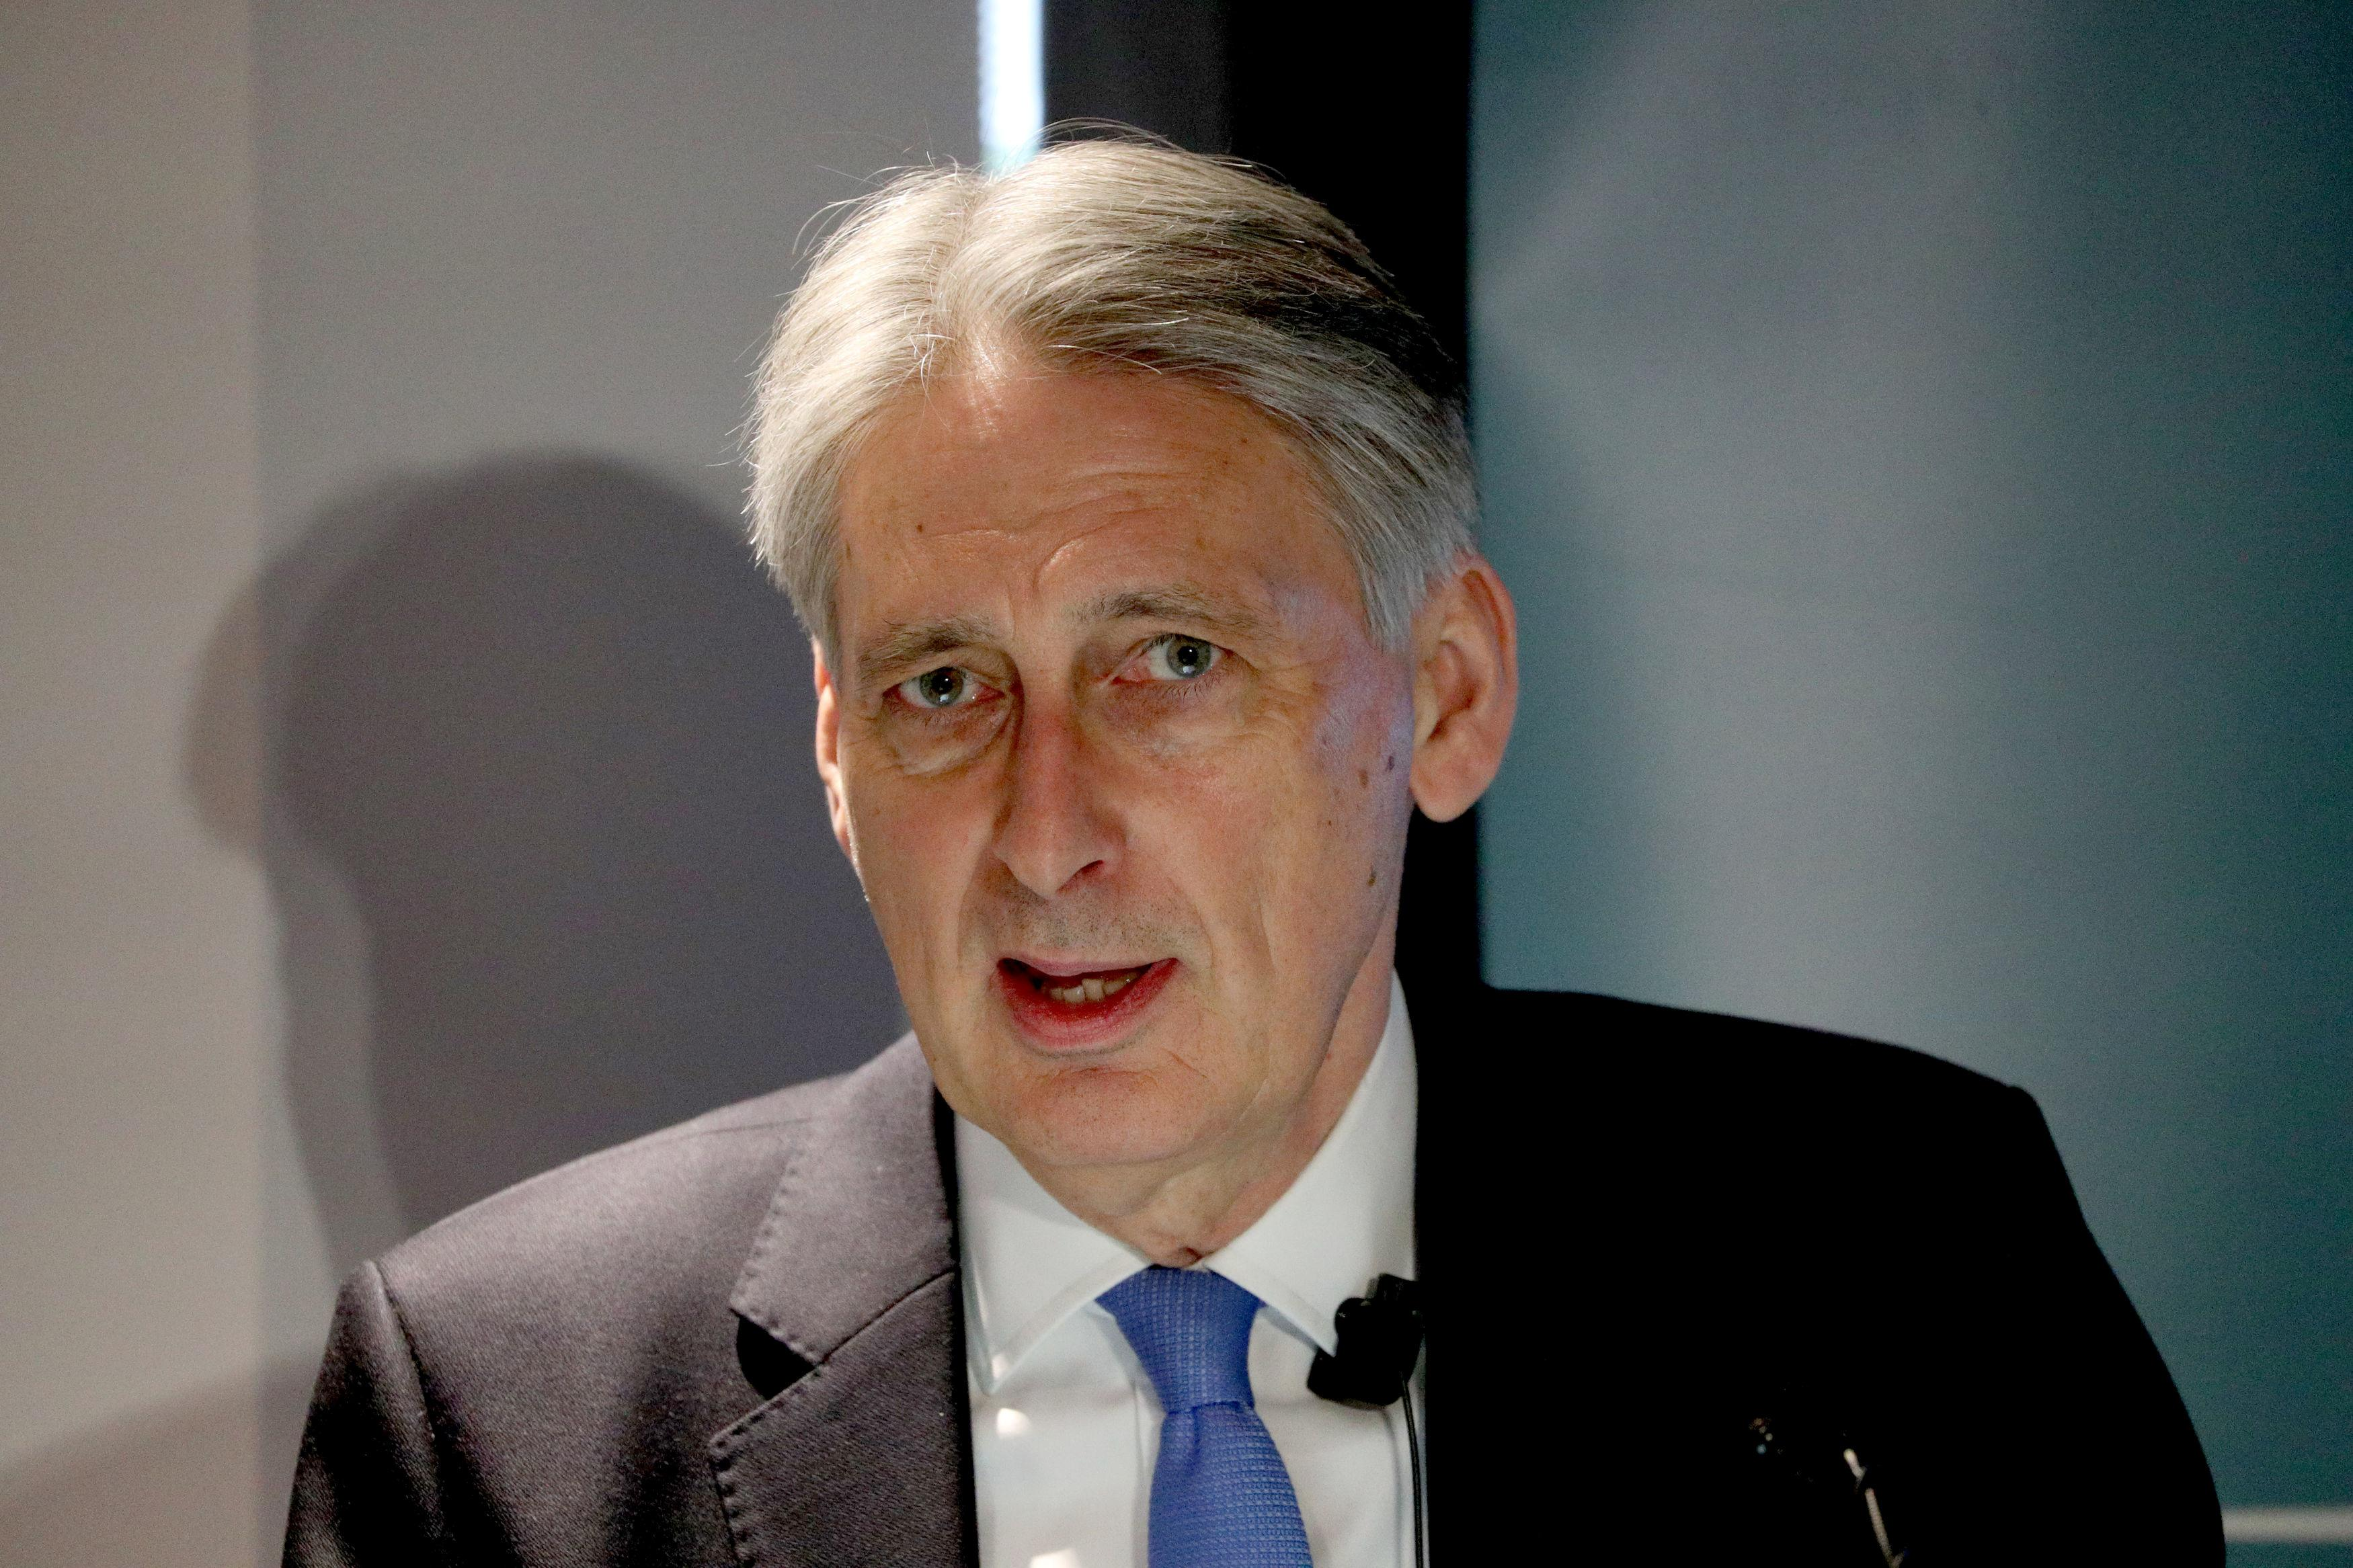 UK hopes Trump and Xi can ease trade tensions at G20 summit: Hammond